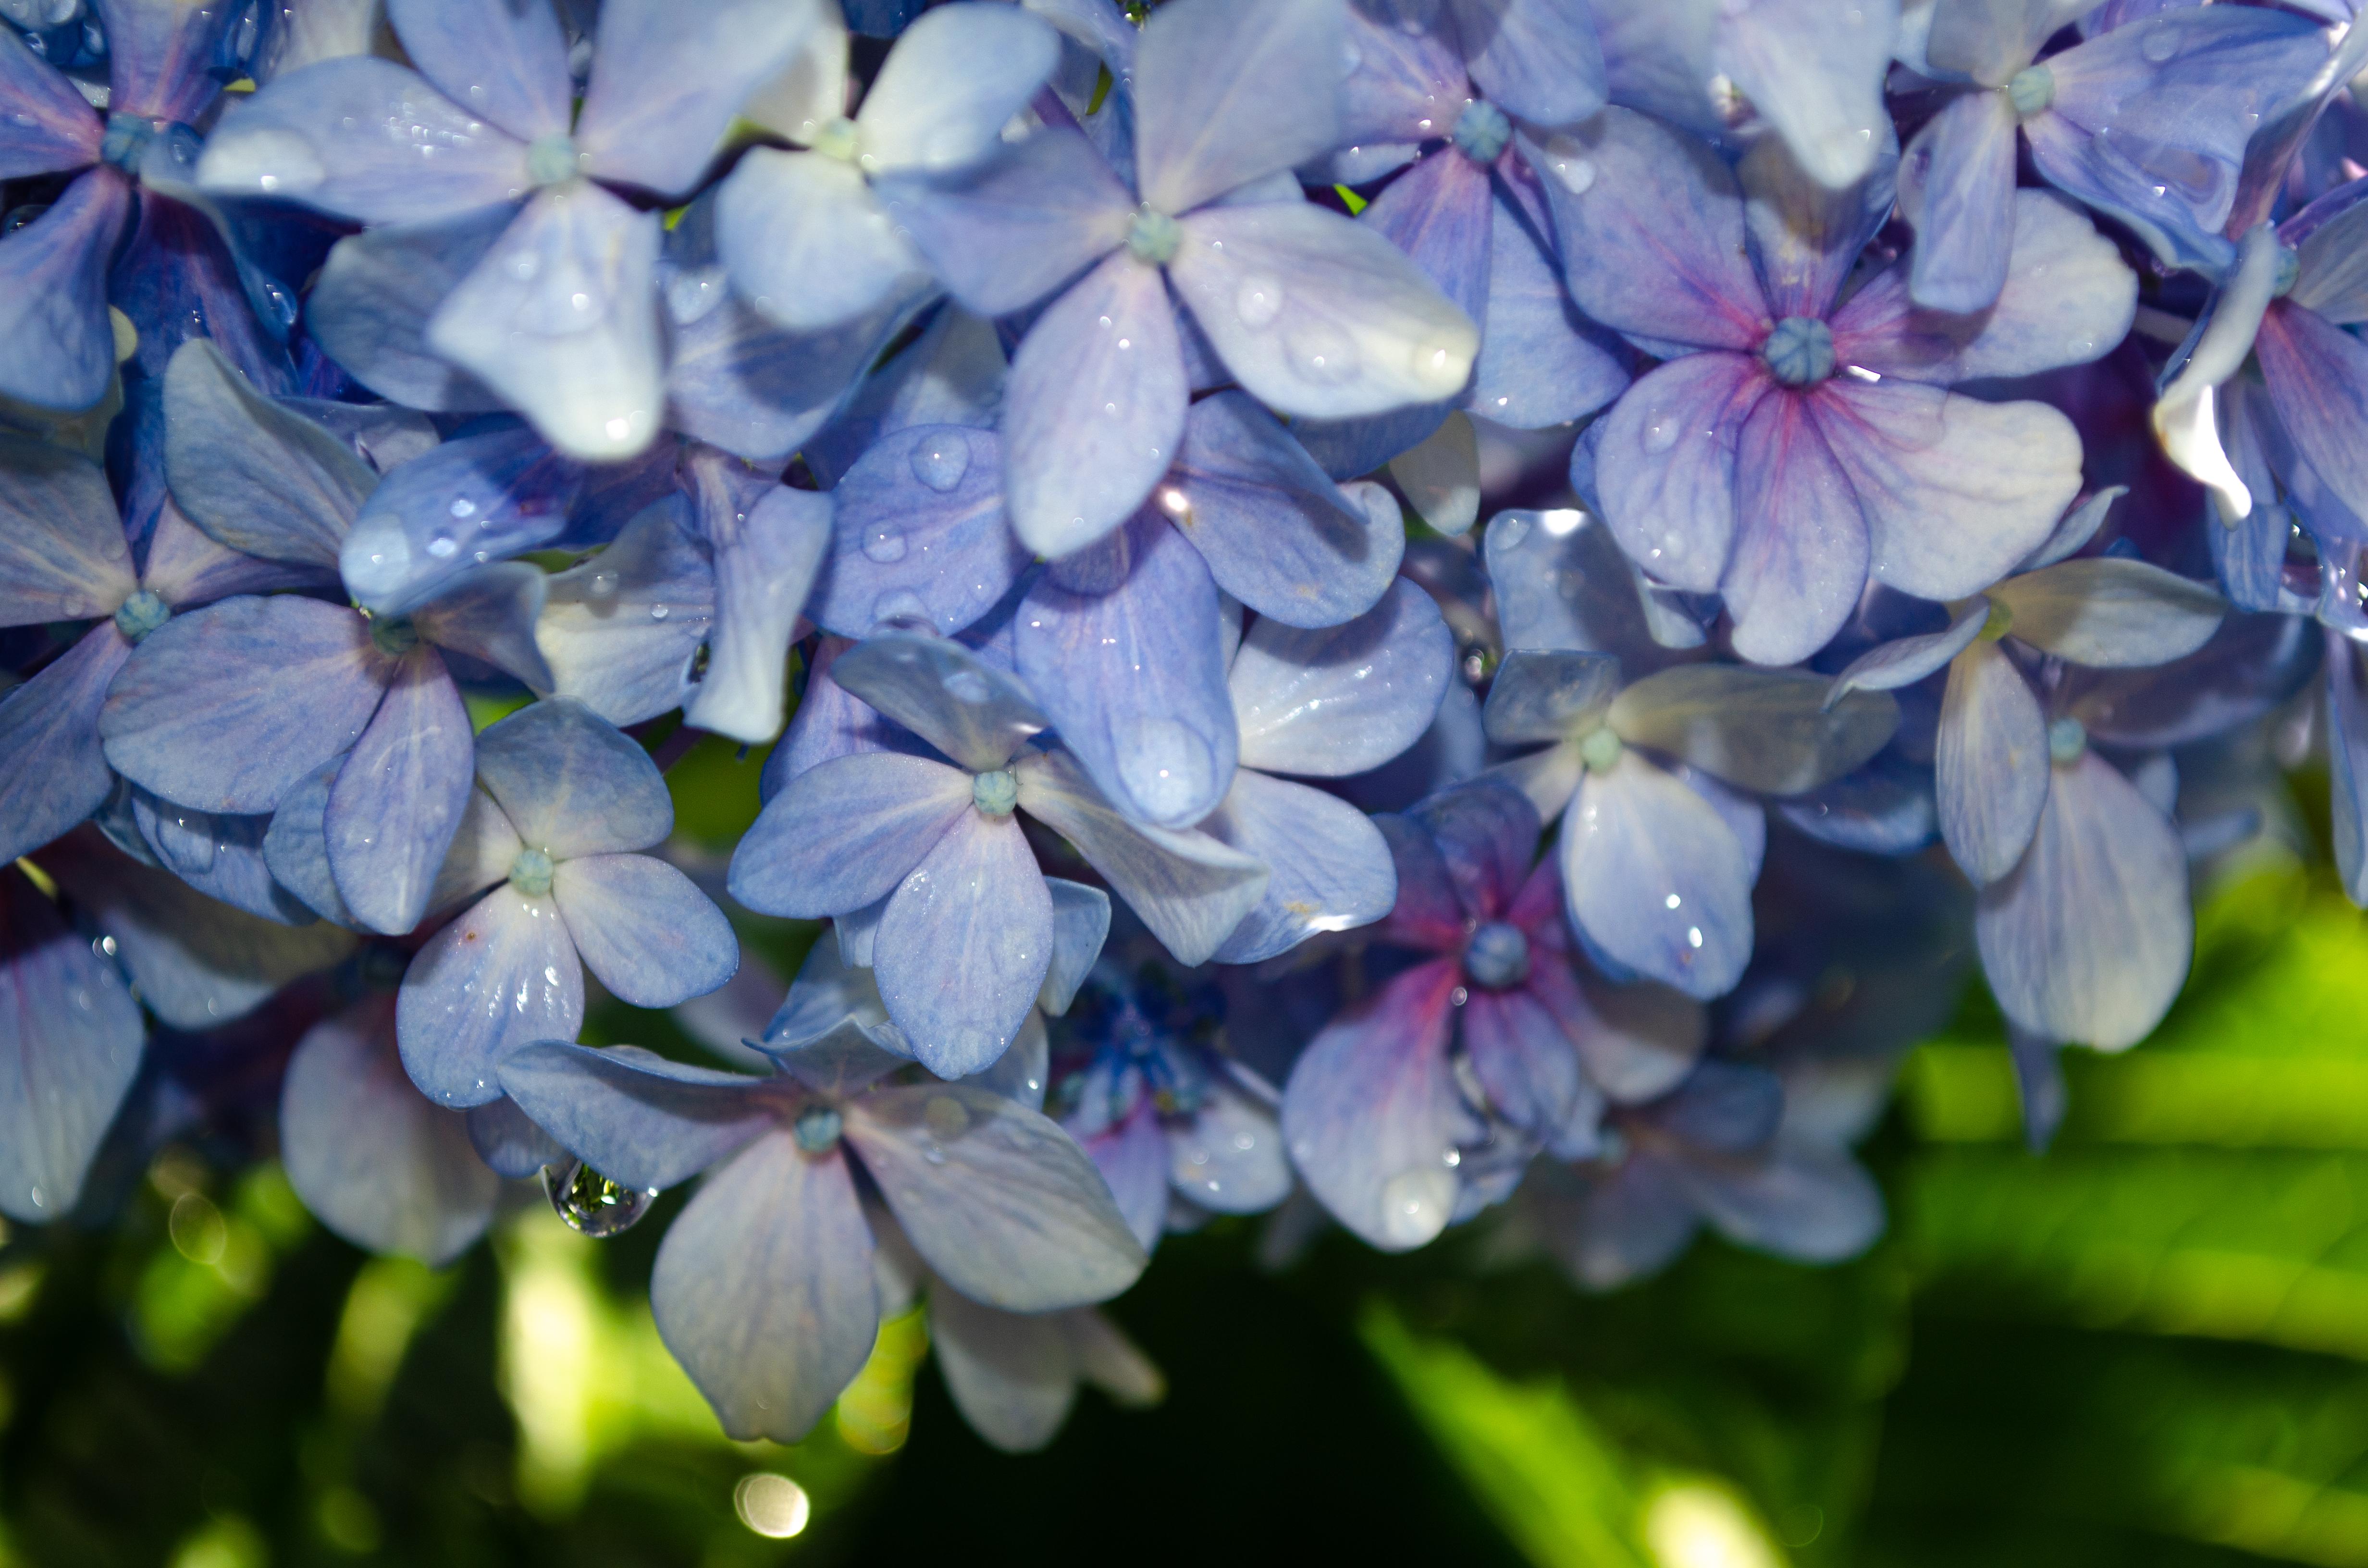 Come Far Fiorire Le Ortensie immagini belle : natura, fiore, viola, blu, verde, rugiada